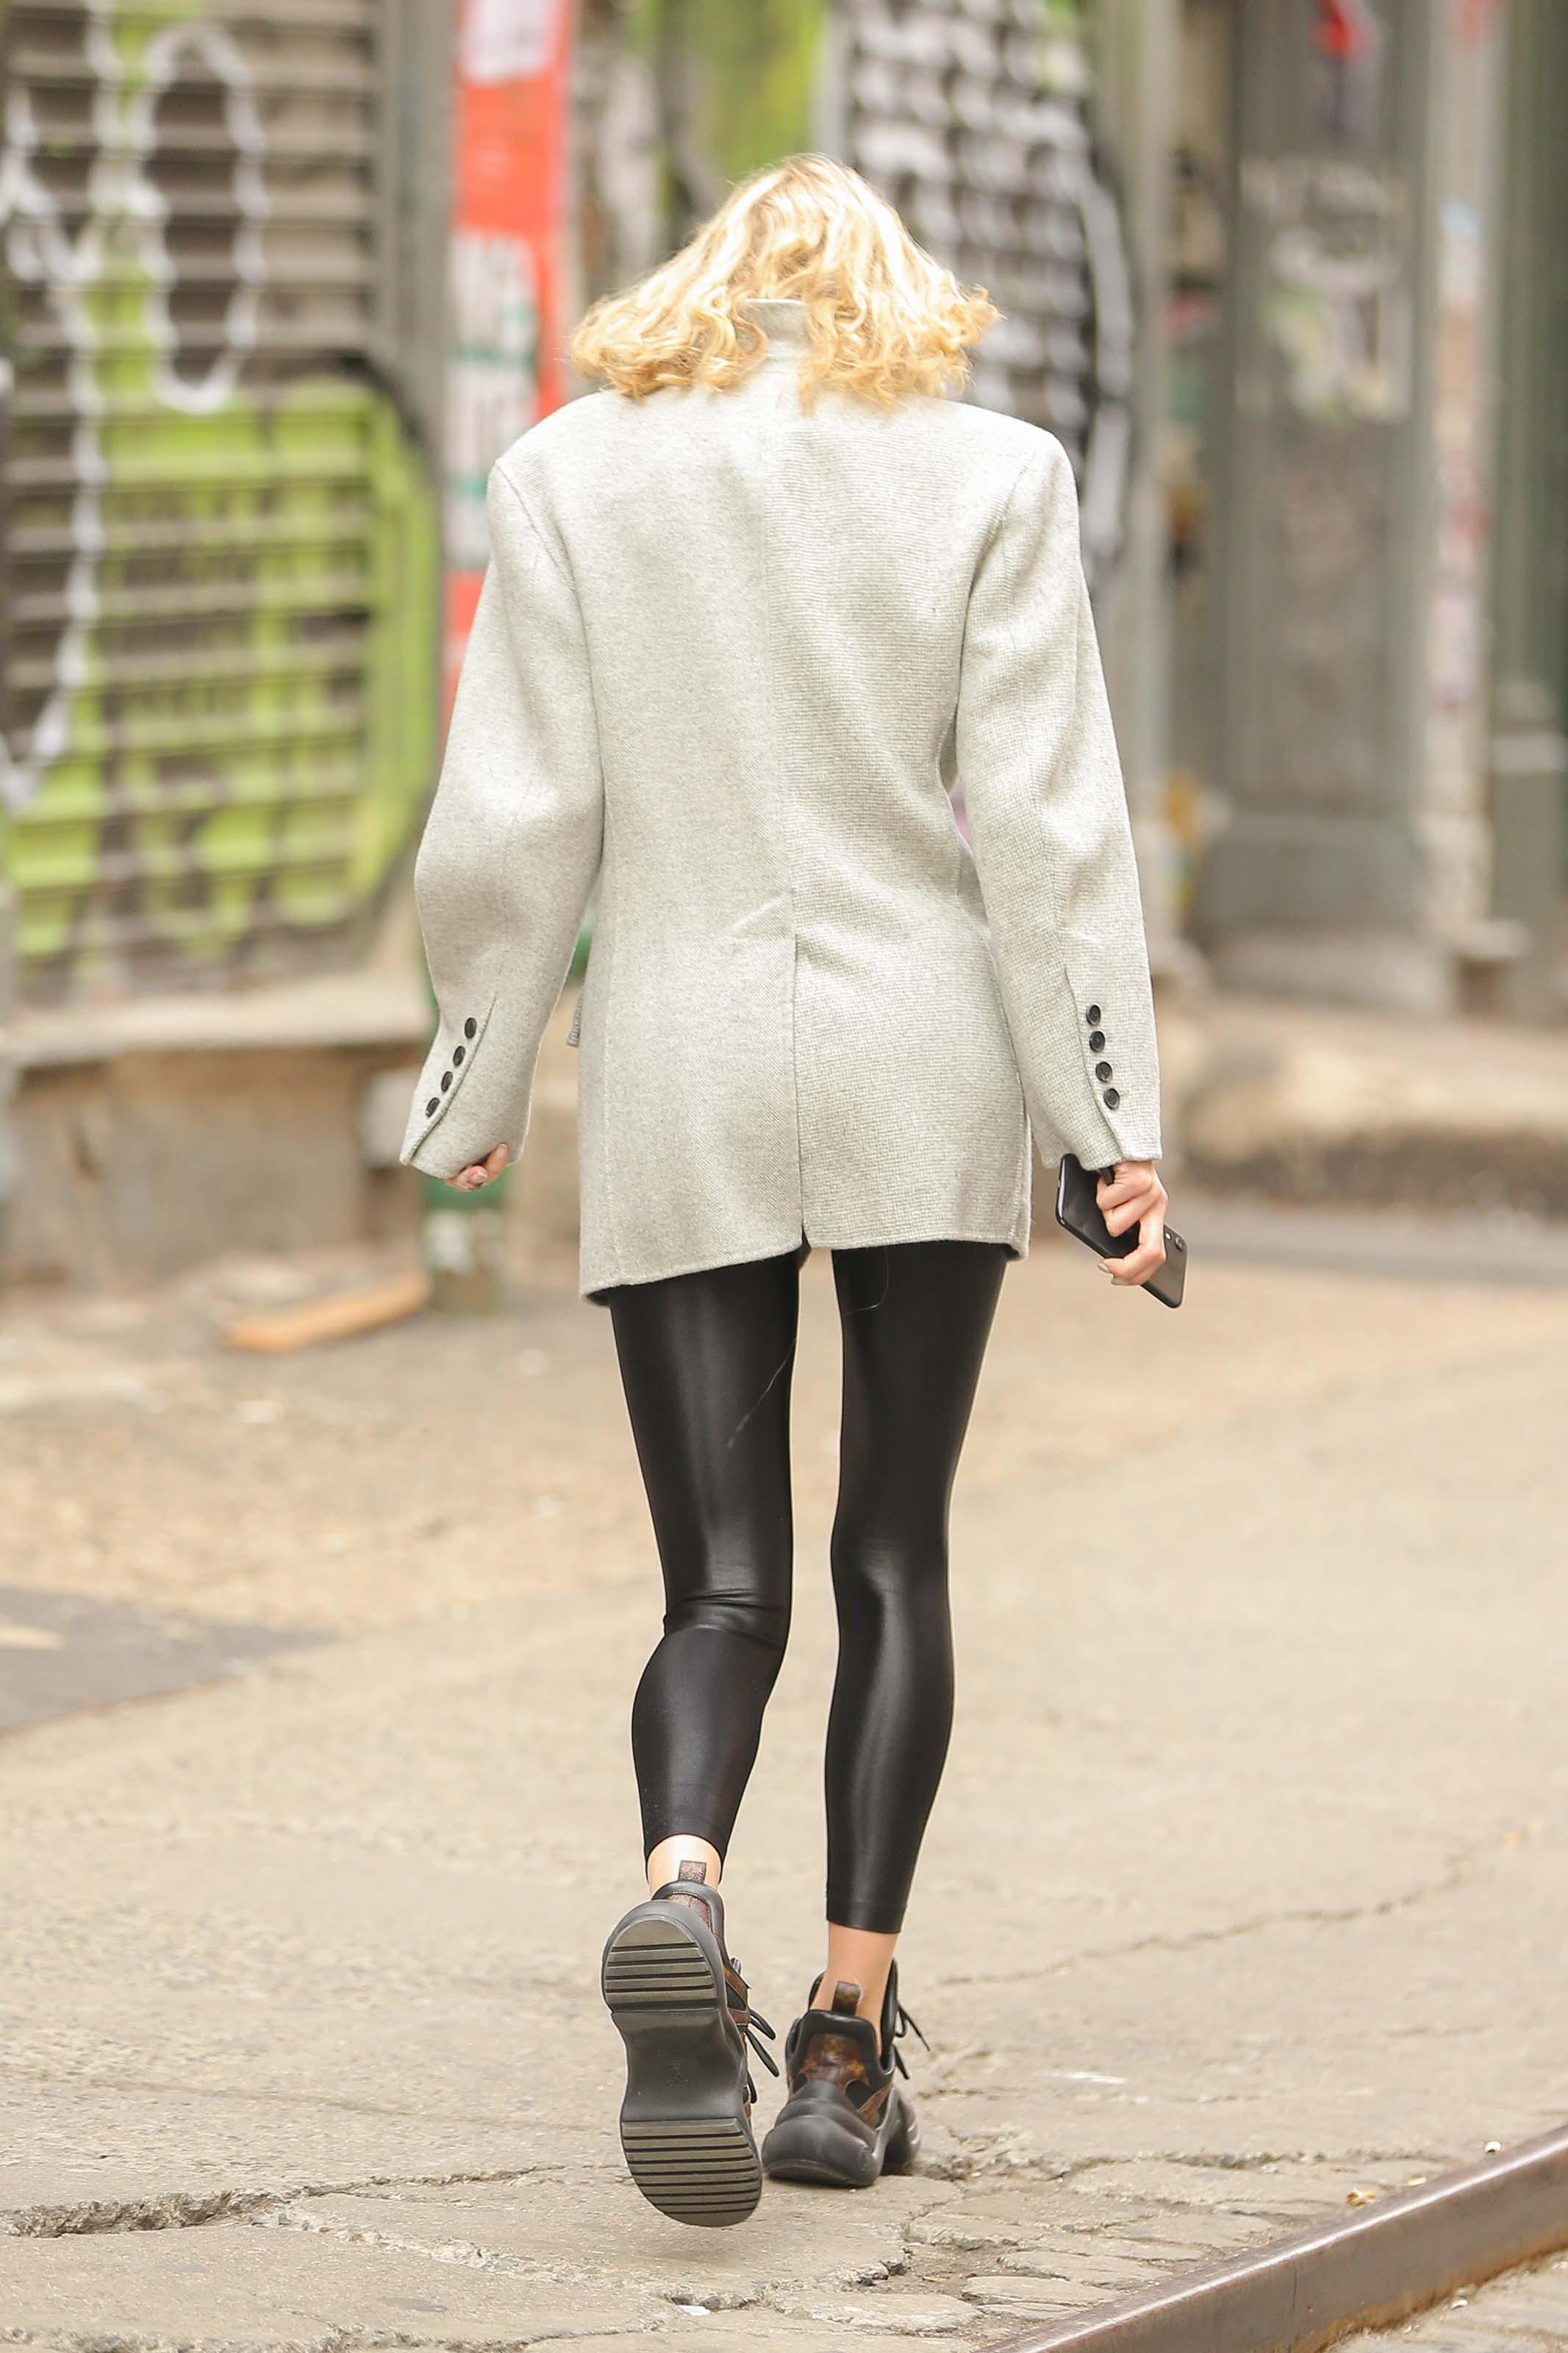 Elsa Hosk out in NYC